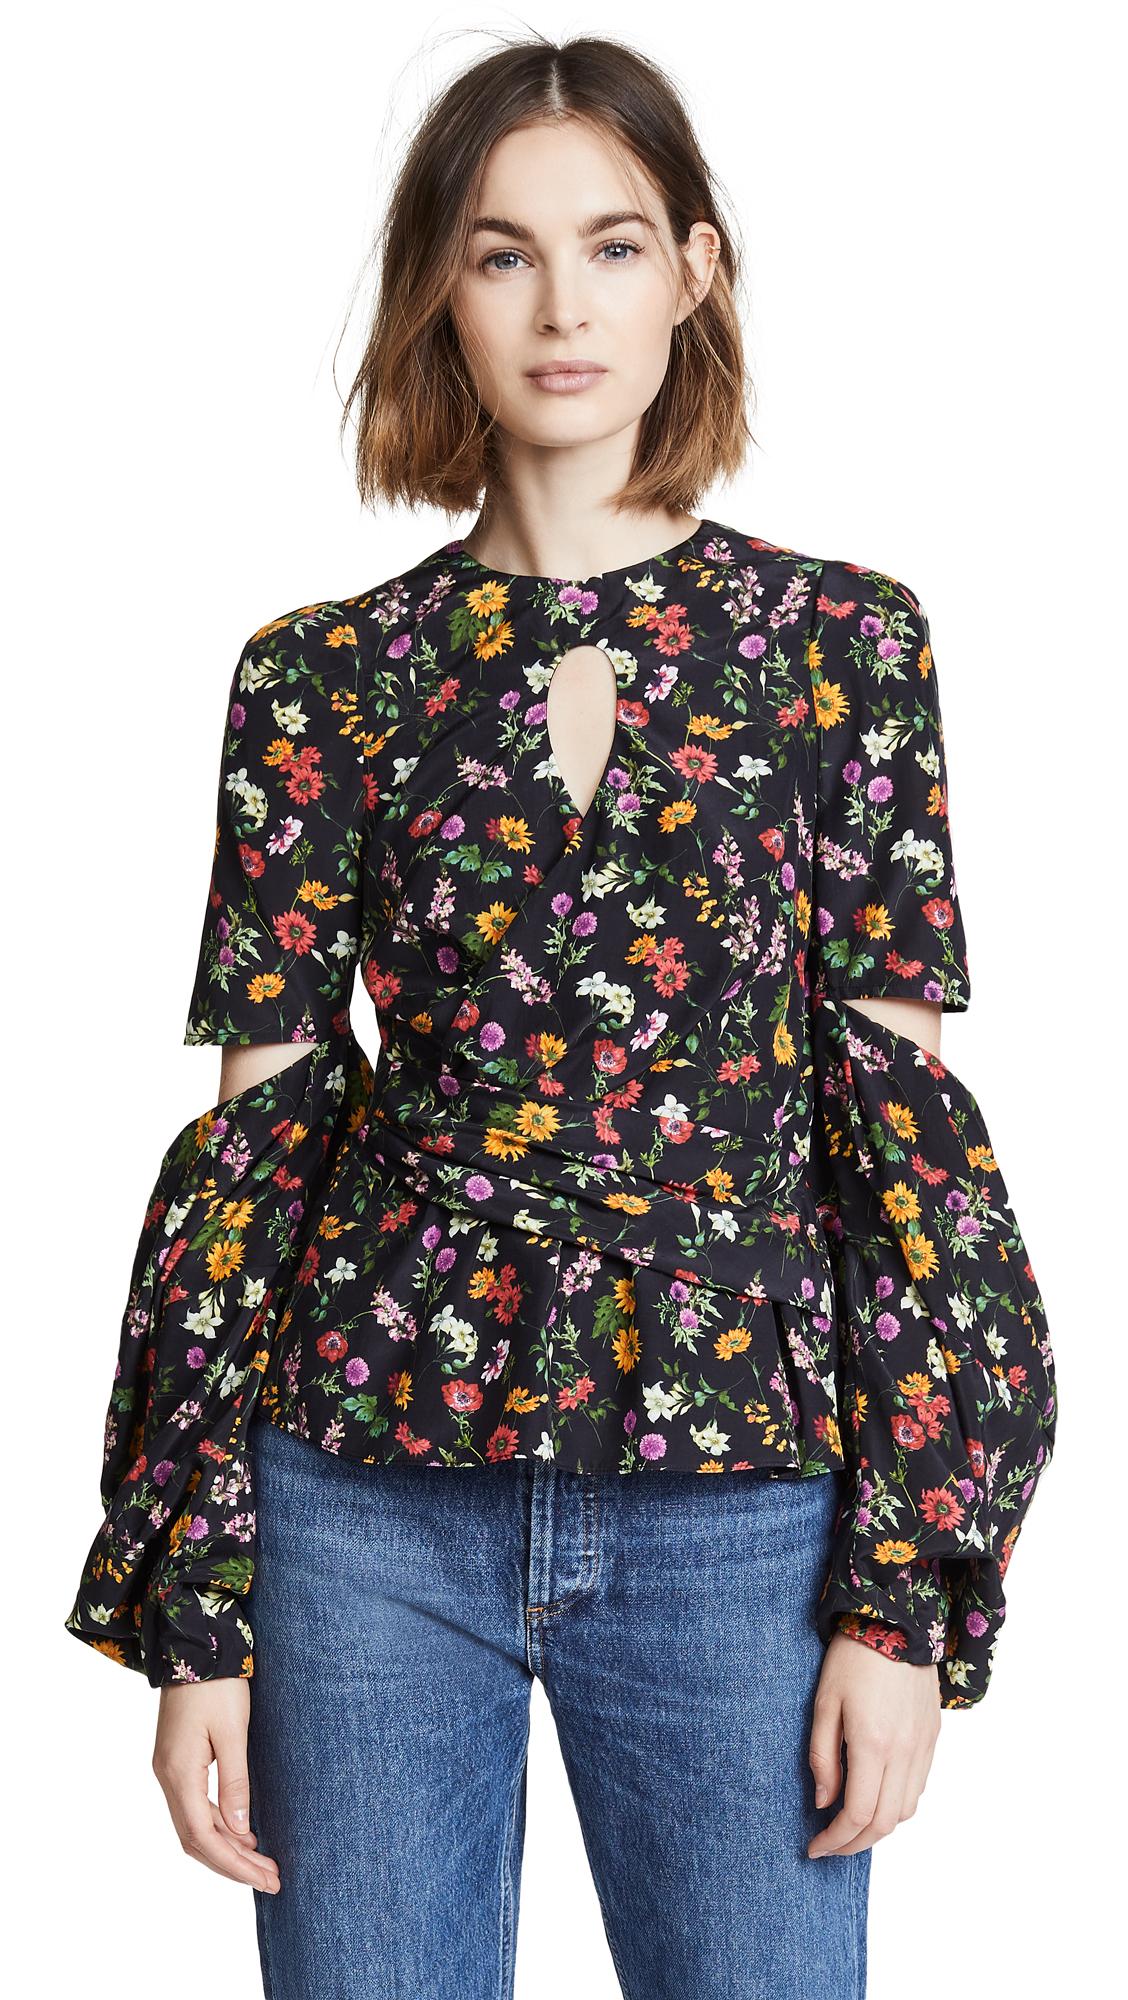 HELLESSY Celeste Silk & Cotton Cutout Blouse in Black Floral